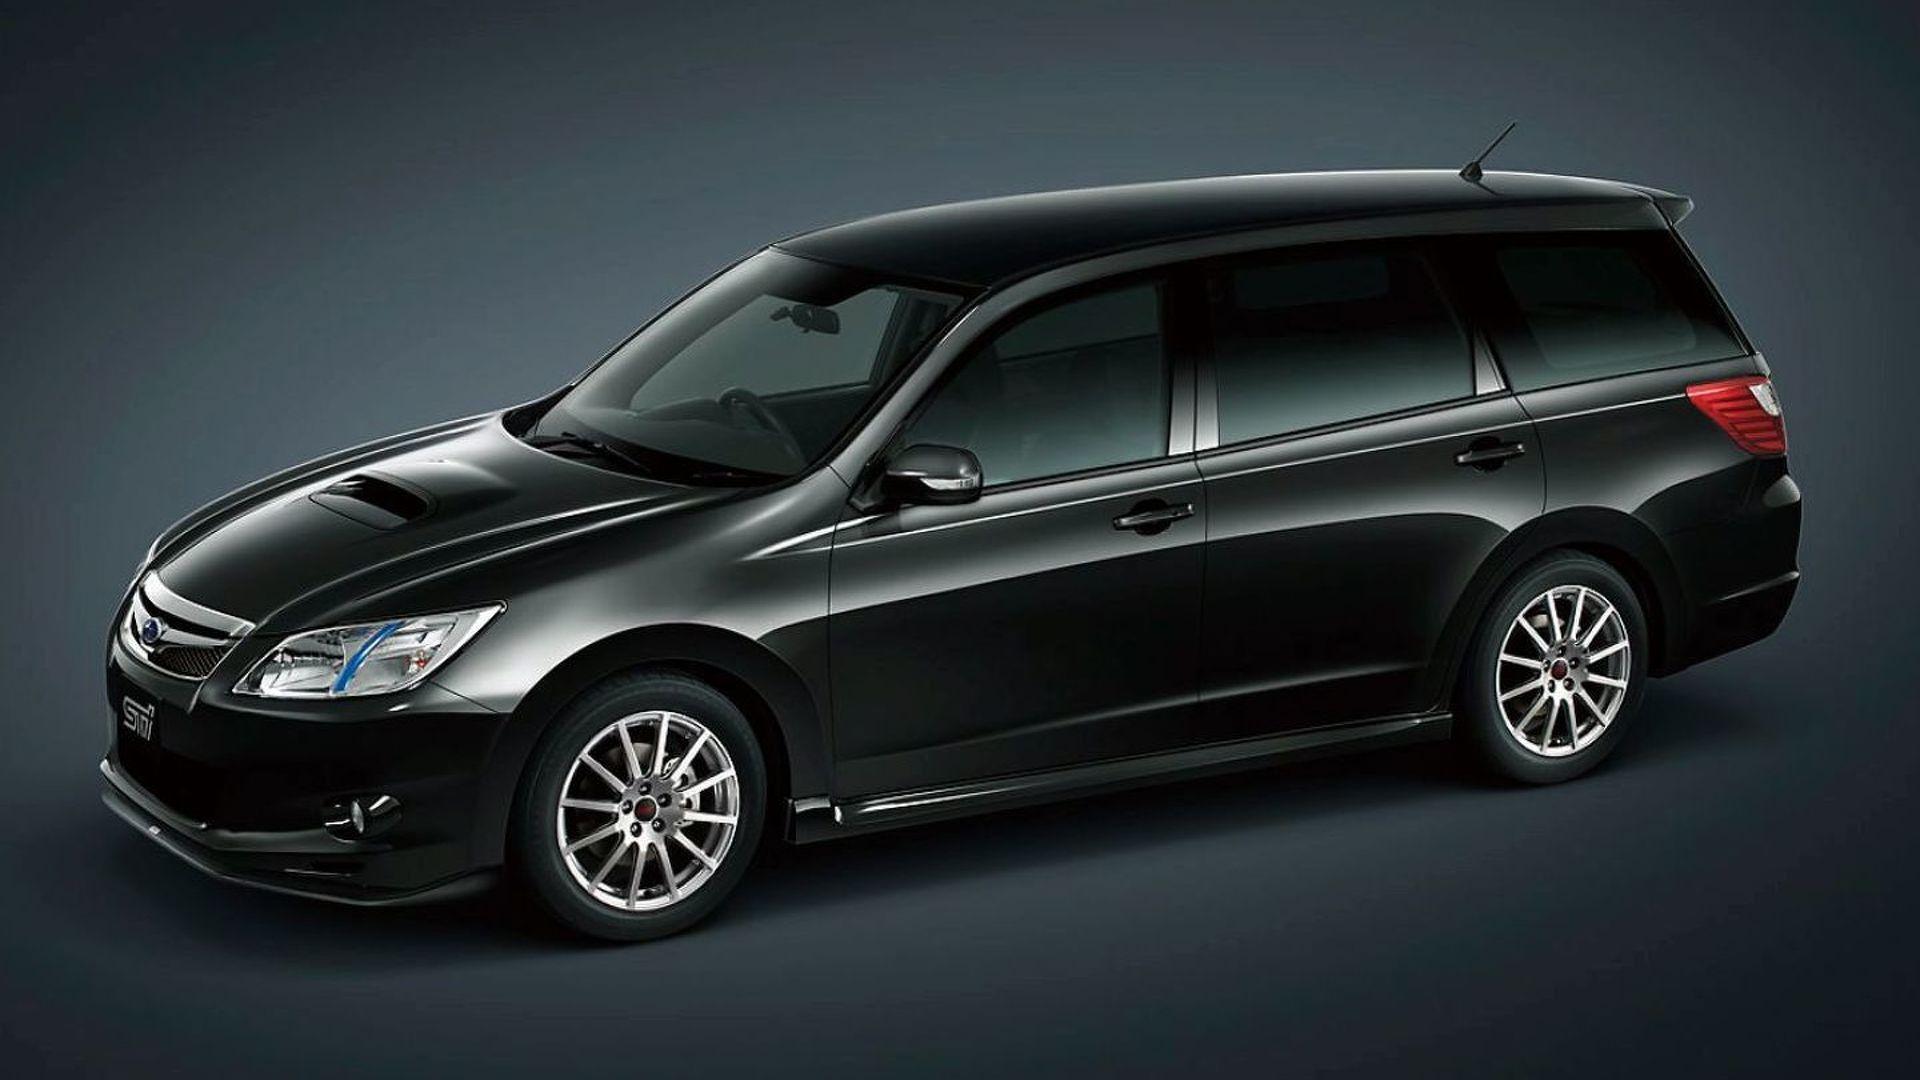 Subaru Exiga 20GT Tuned by STI Revealed in Tokyo  Motor1com Photos